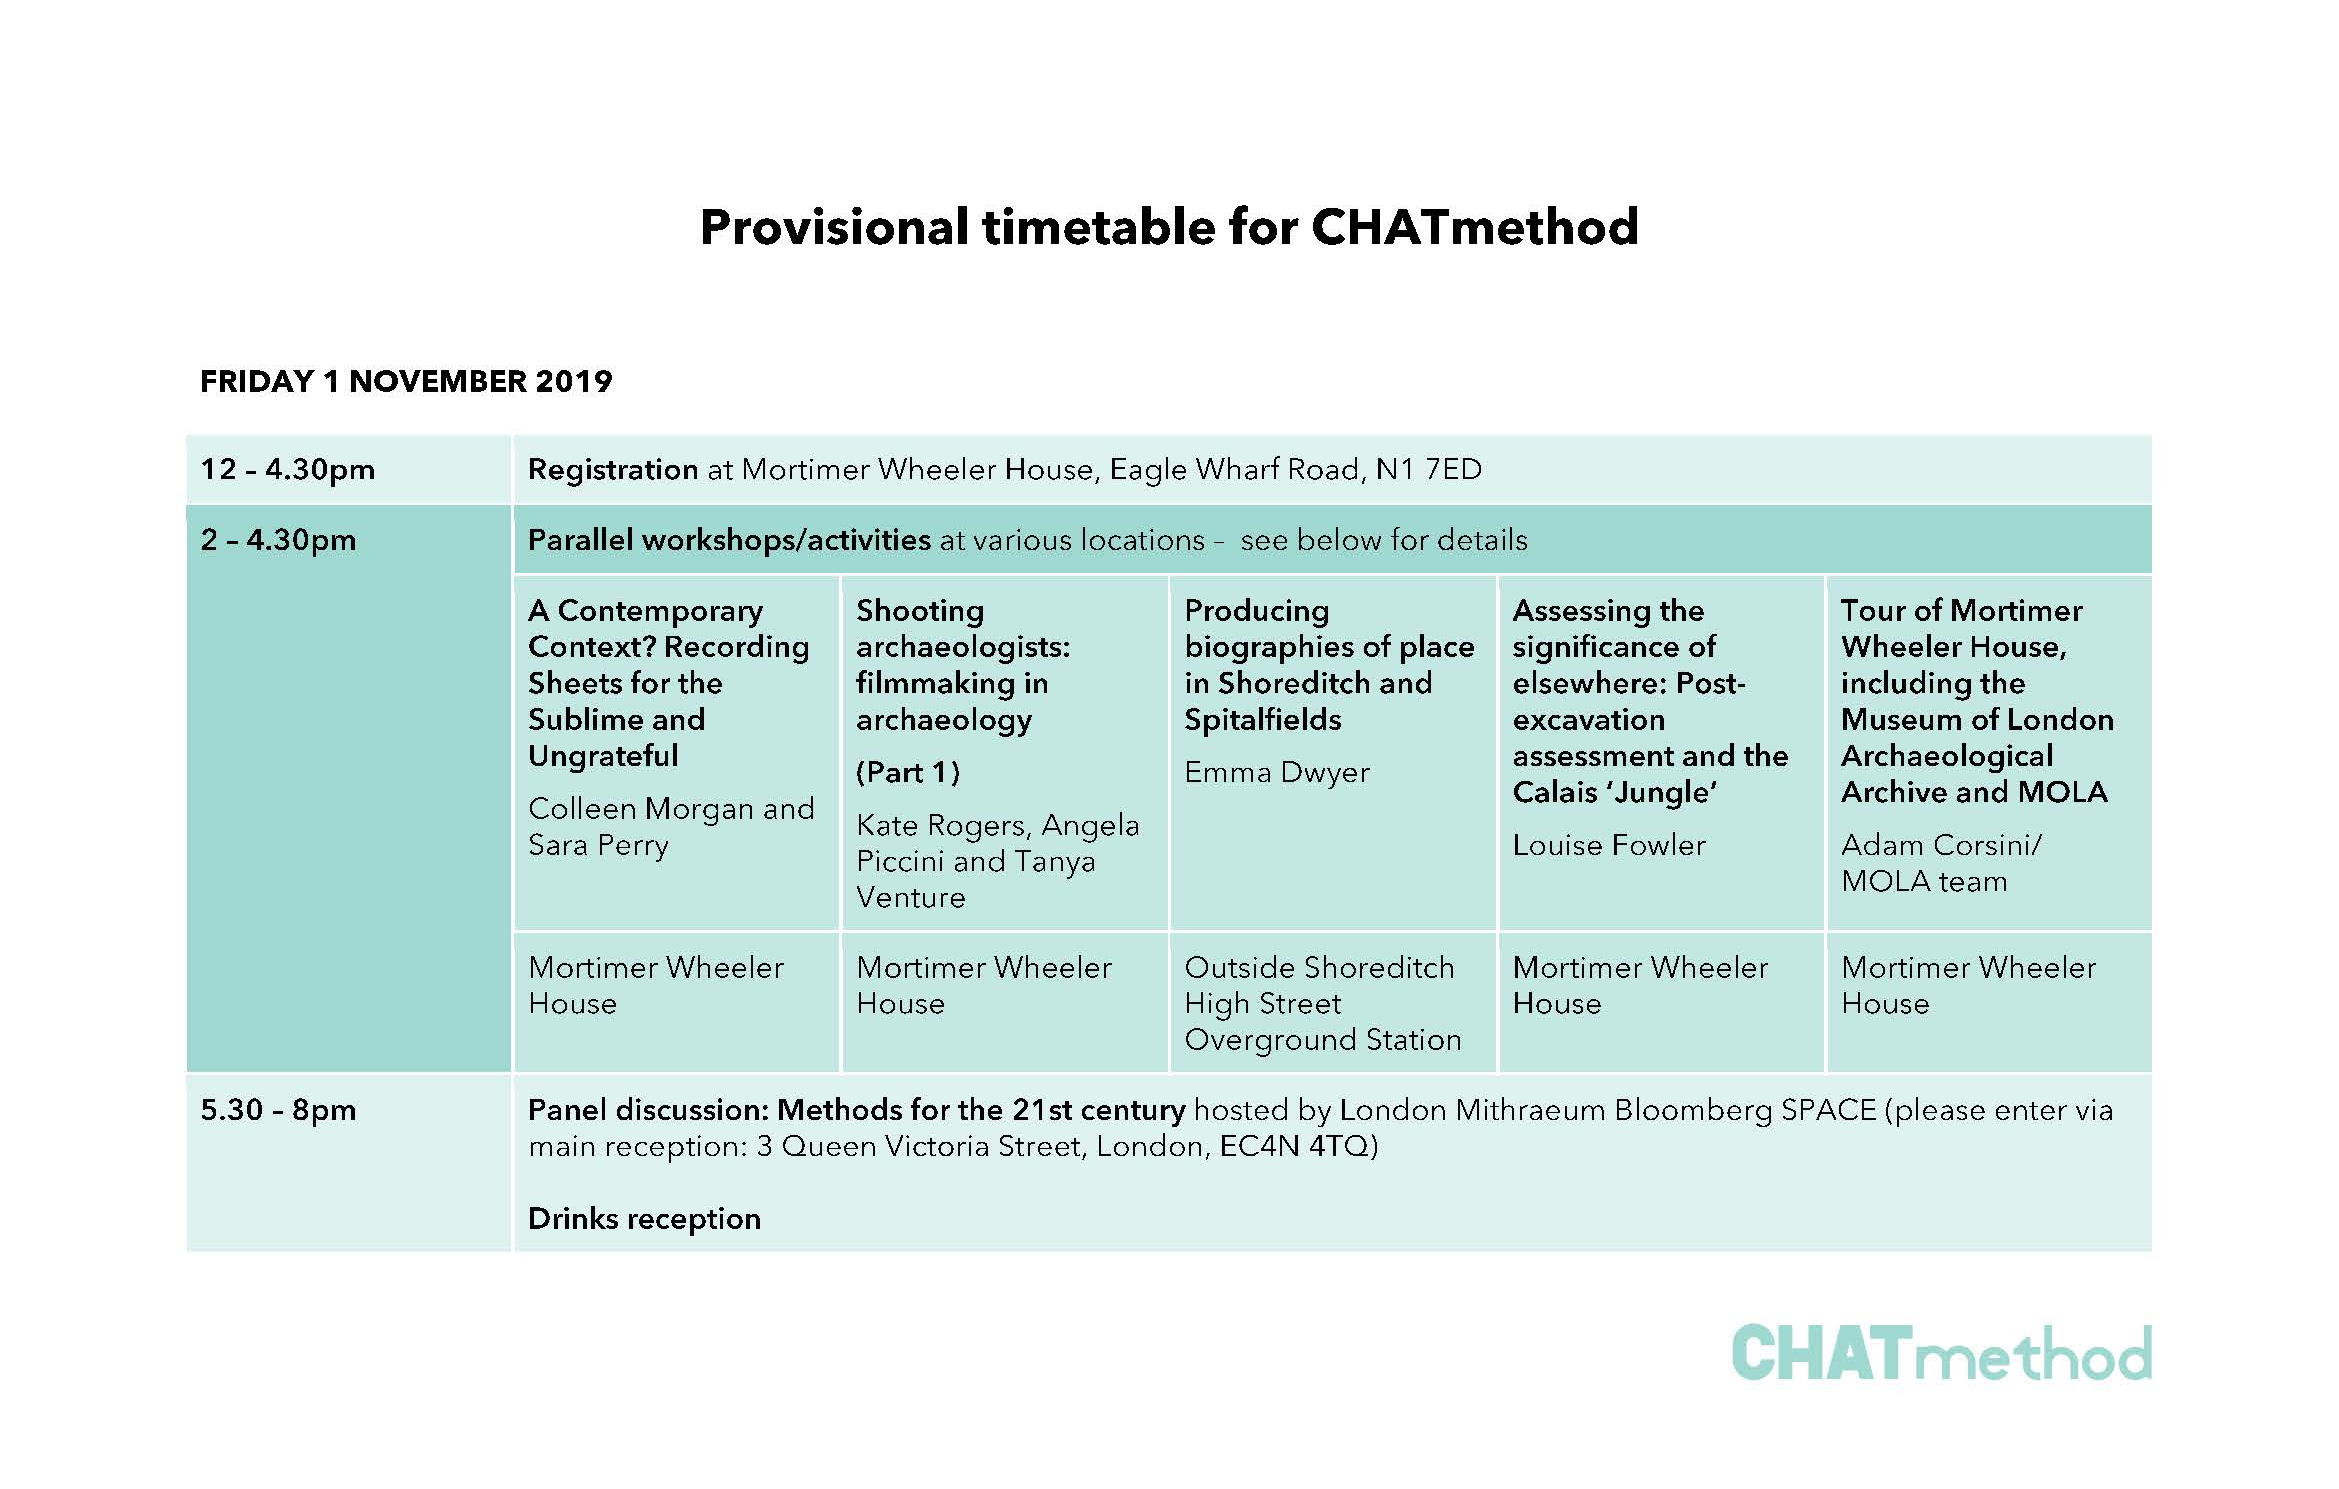 CHATmethod provisional timetable - Day 1